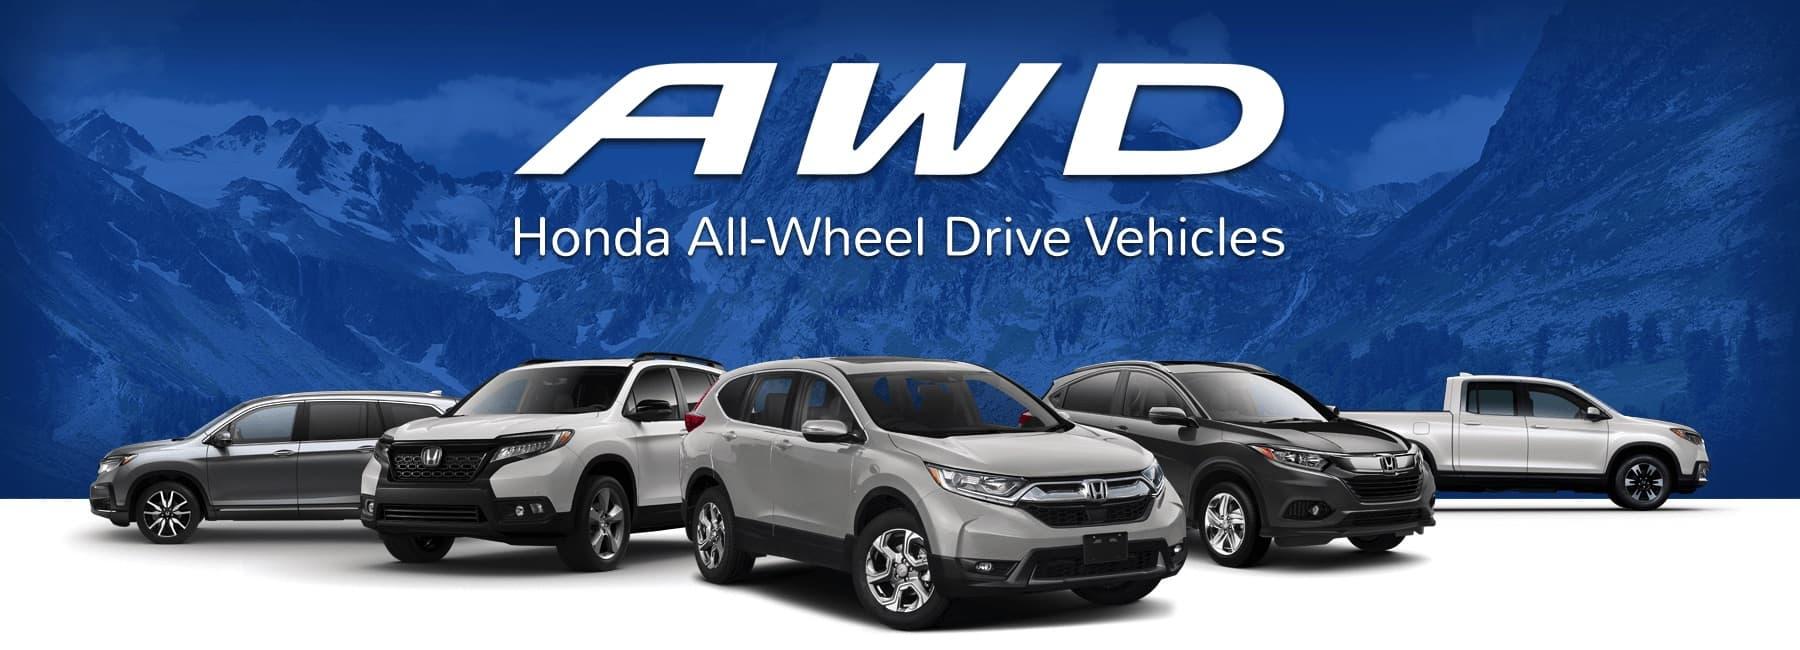 Honda's AWD Vehicles | HR-V, Passport, CR-V, Pilot | Capital